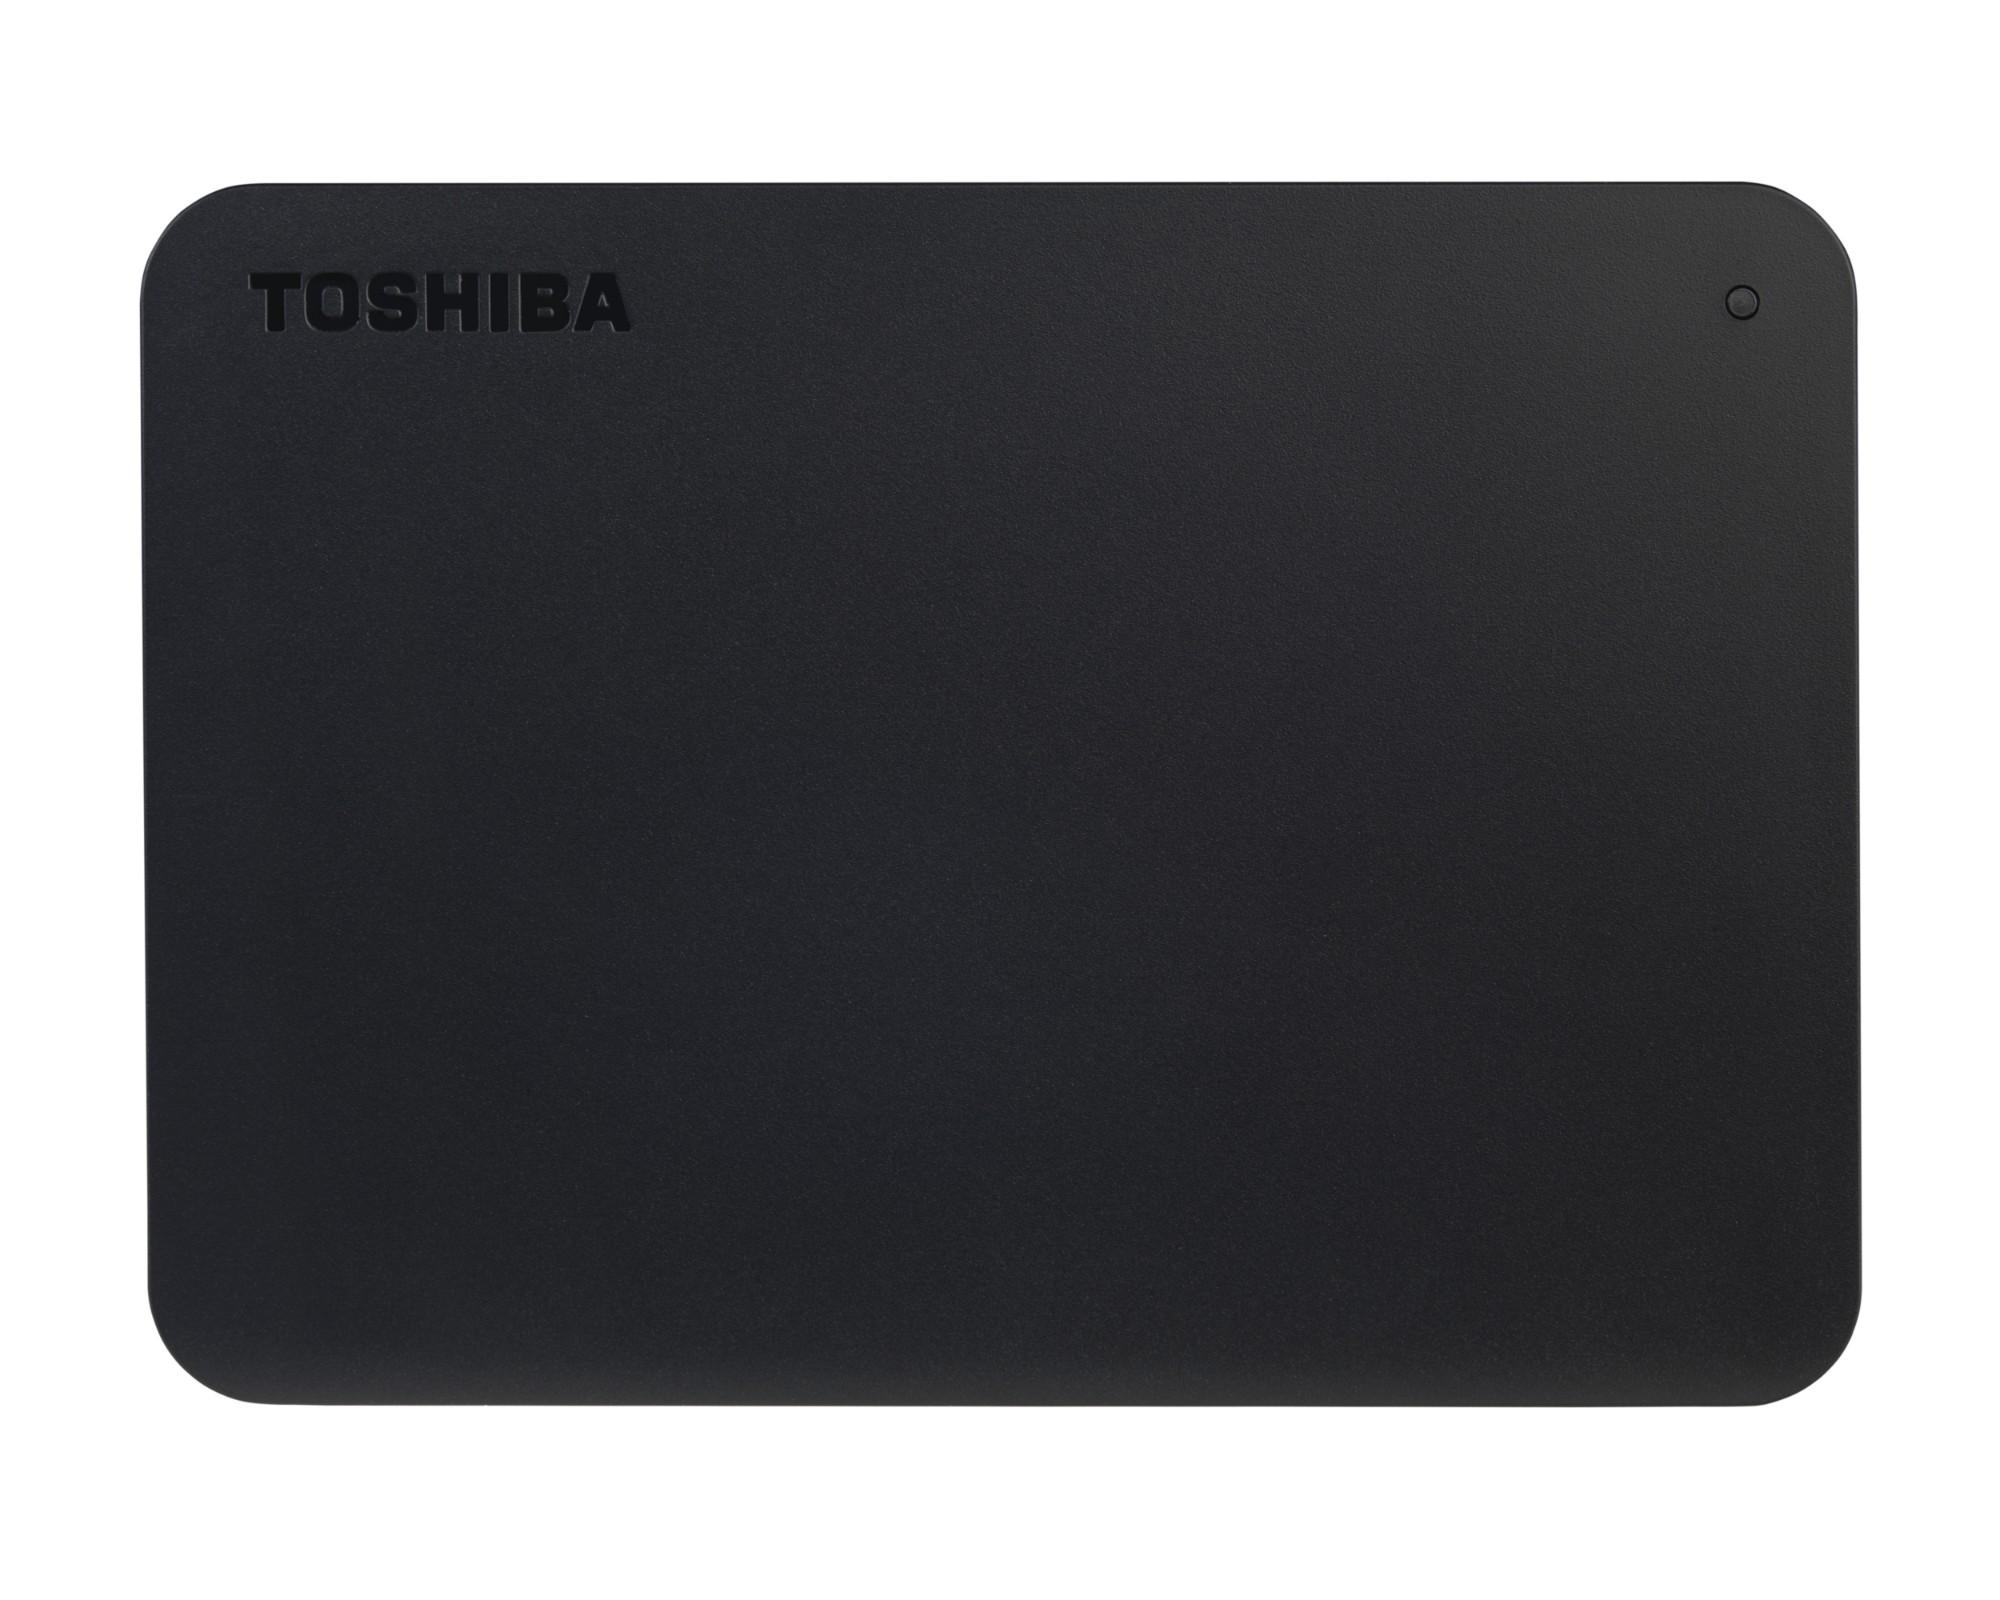 Toshiba Canvio Basics 1 TB Black